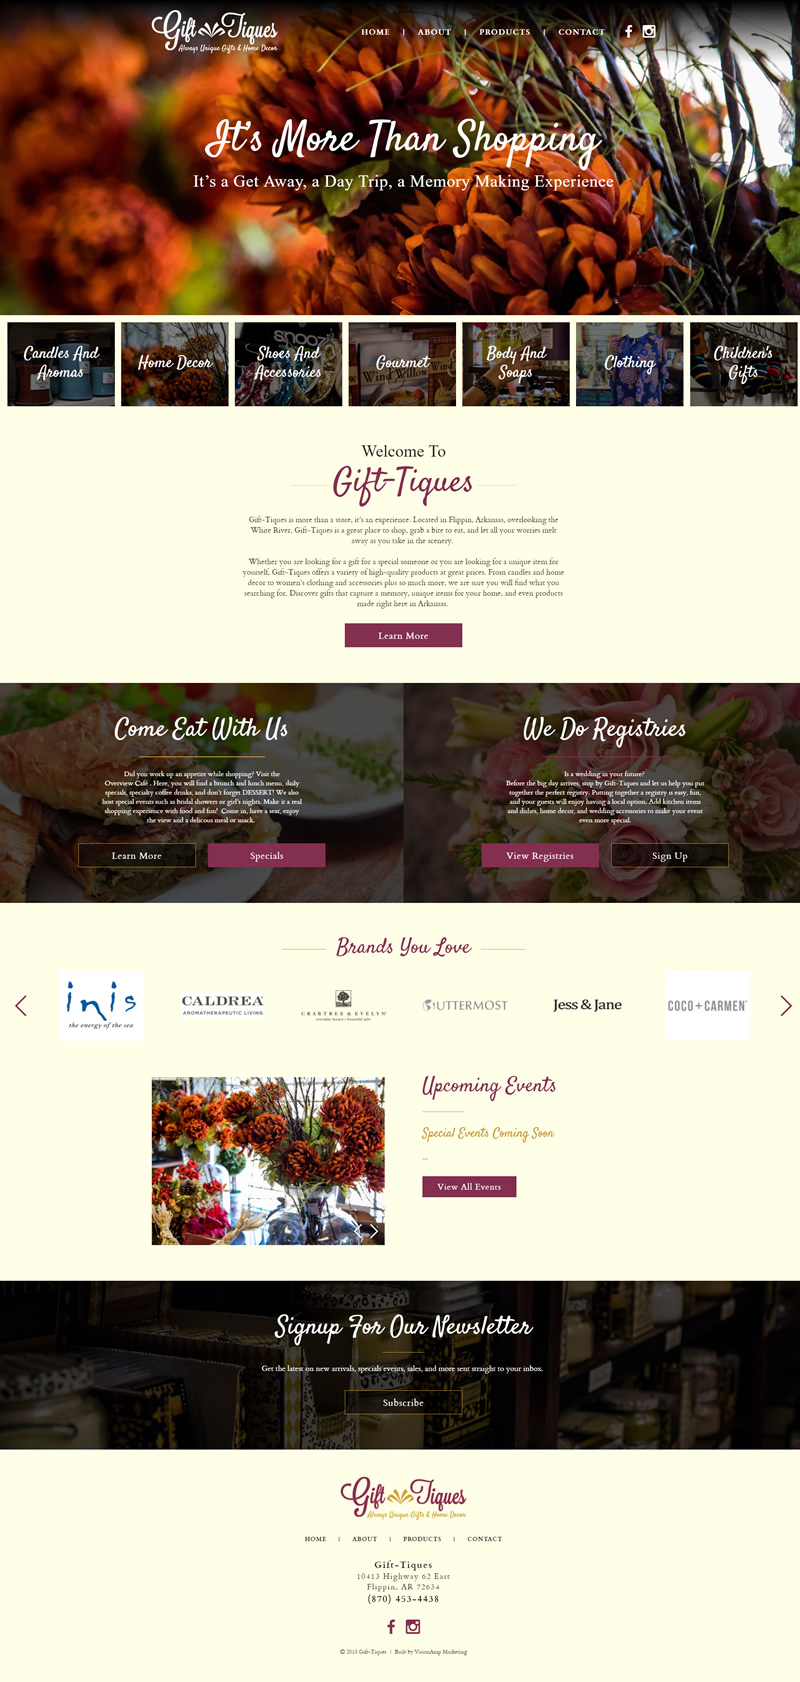 Gift Tiques Full Web Design Image